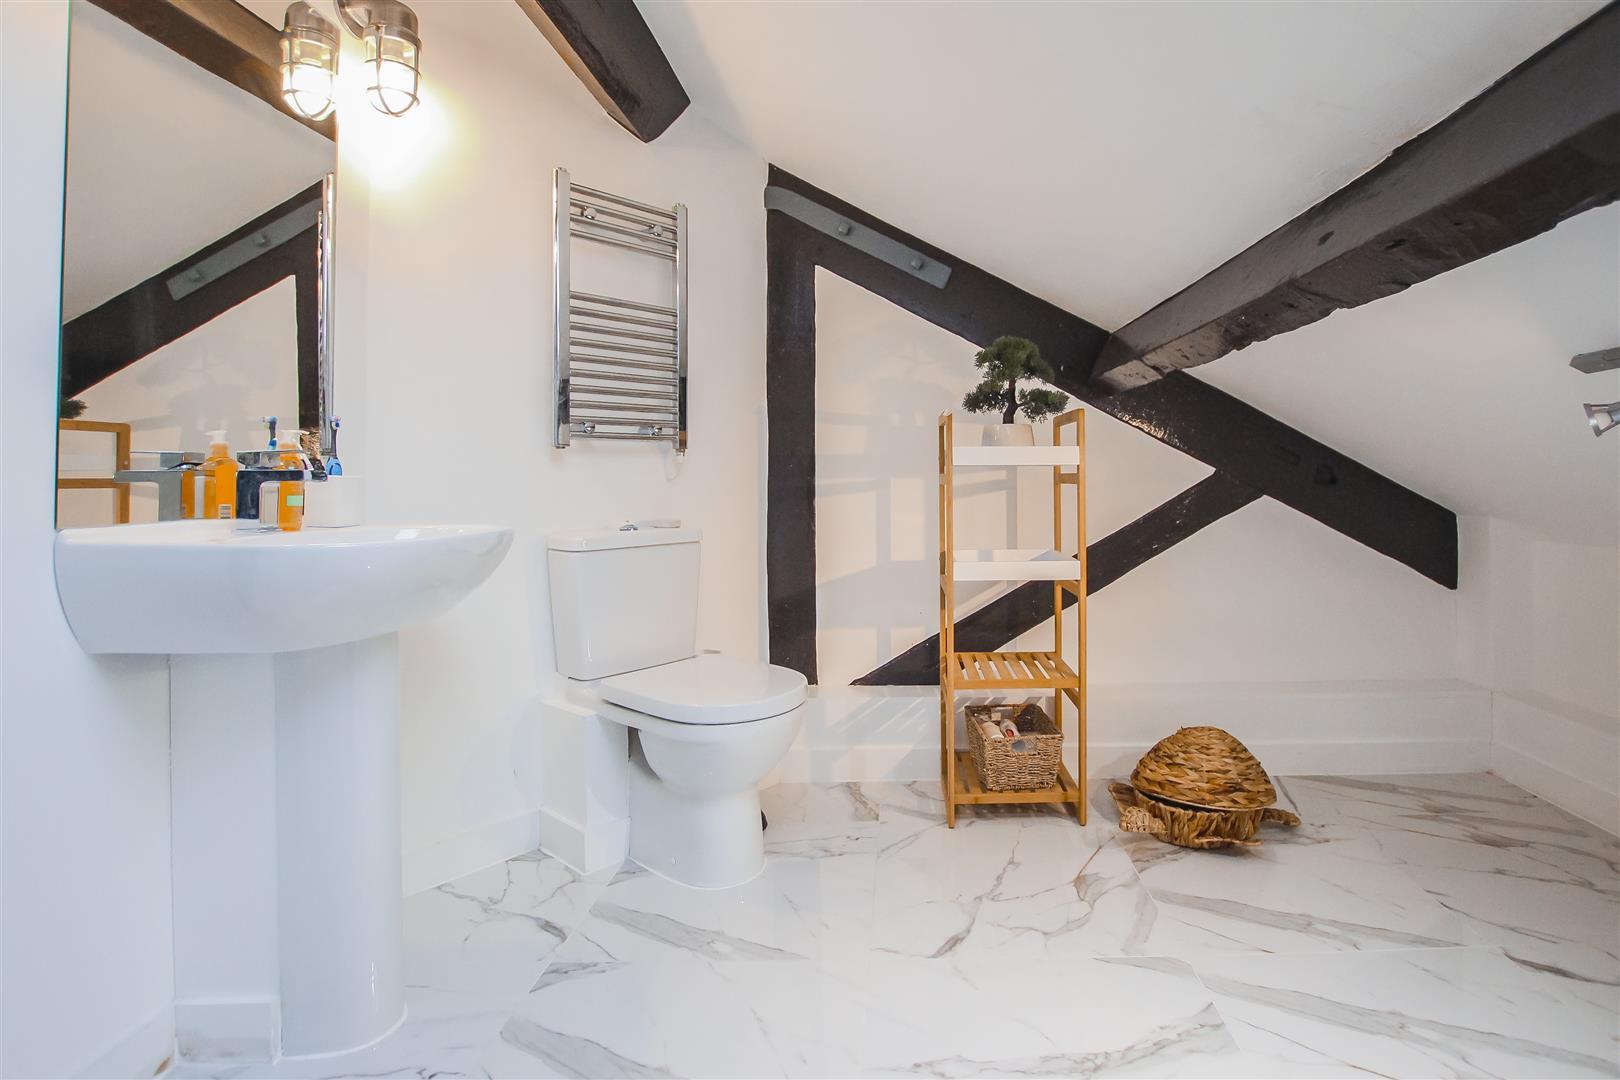 3 Bedroom Duplex Apartment For Sale - Image 47